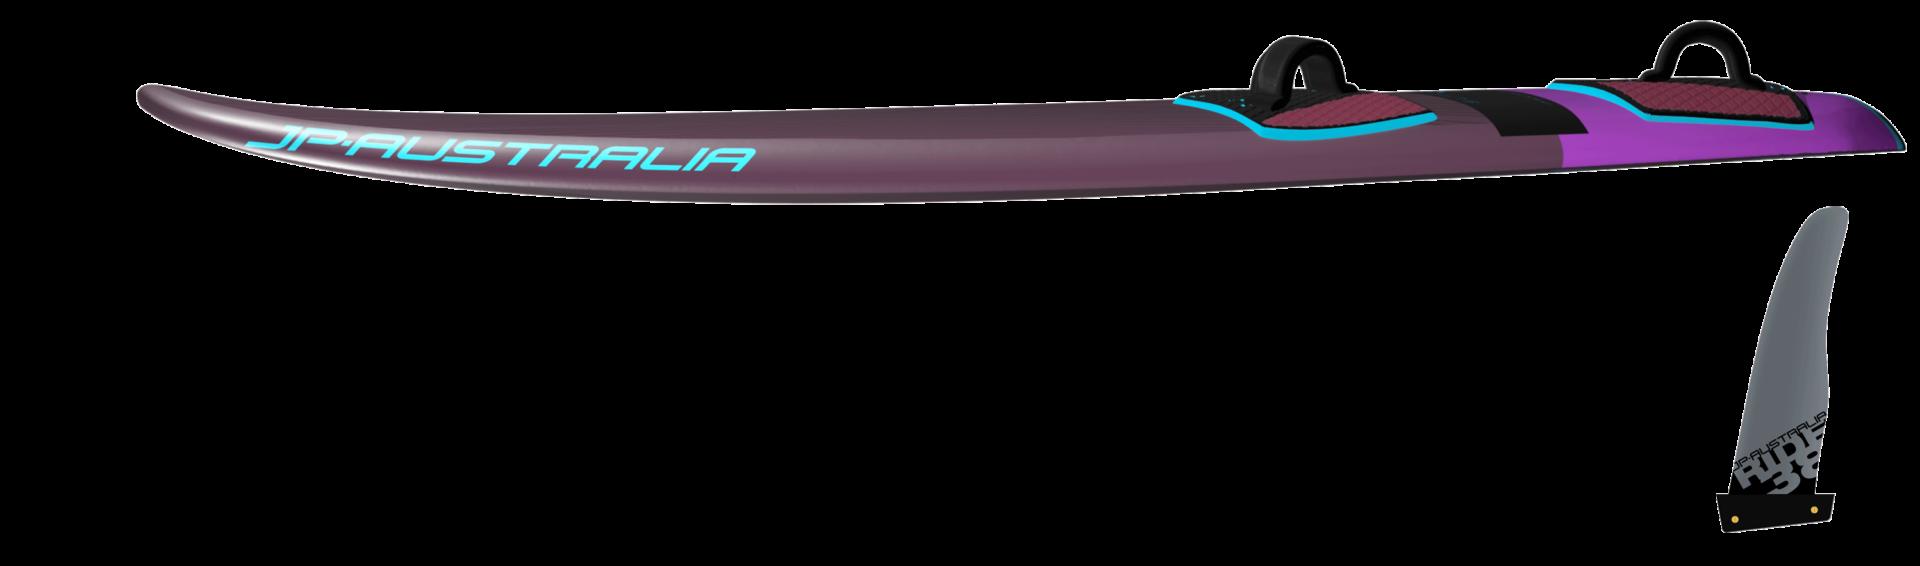 JP Australia SuperRide FWS 2020